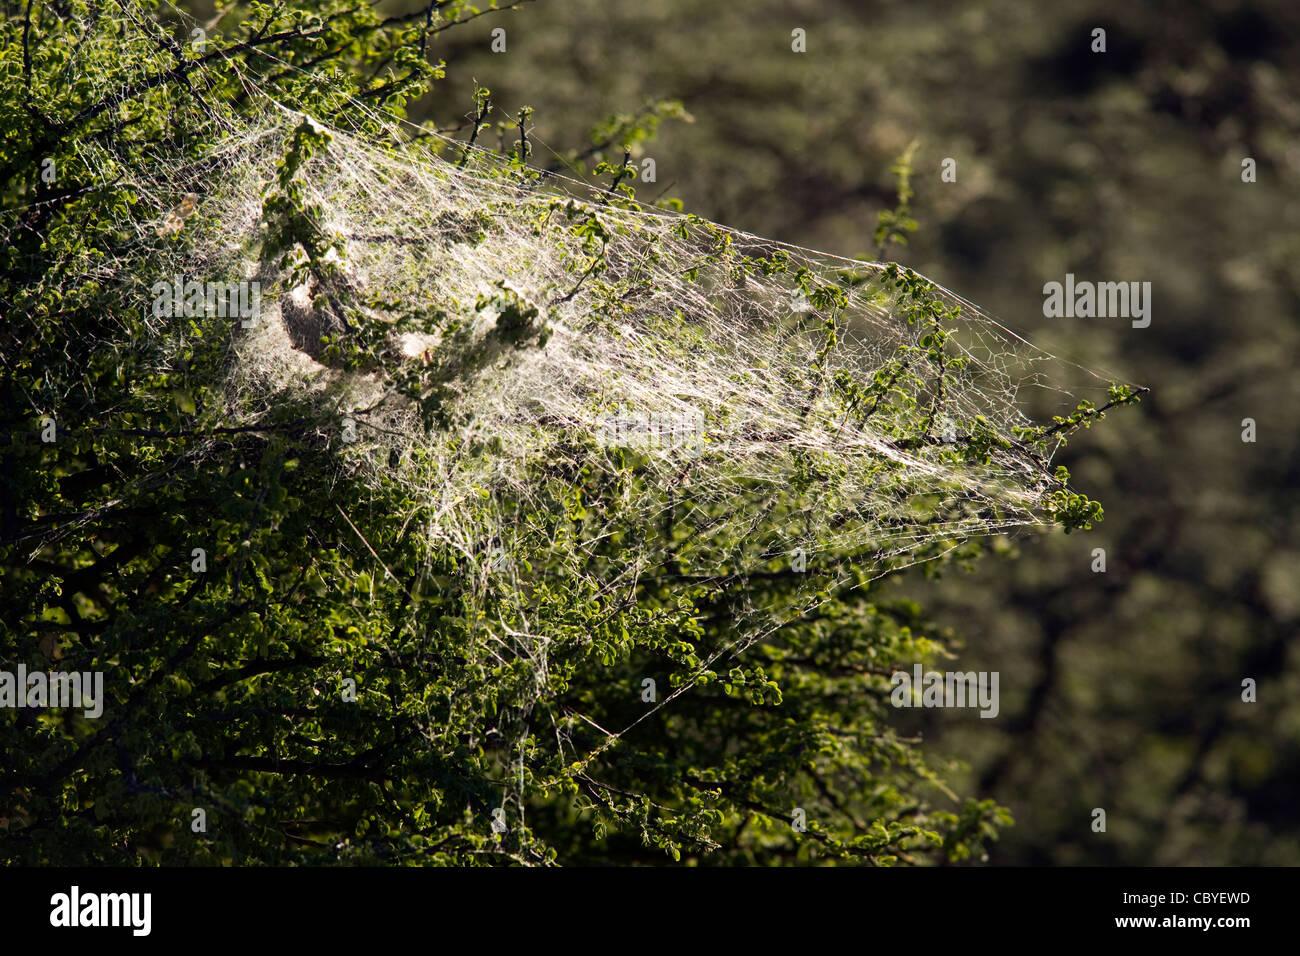 Communal Spider Web - Okonjima, near Otjiwarongo, Namibia, Africa - Stock Image